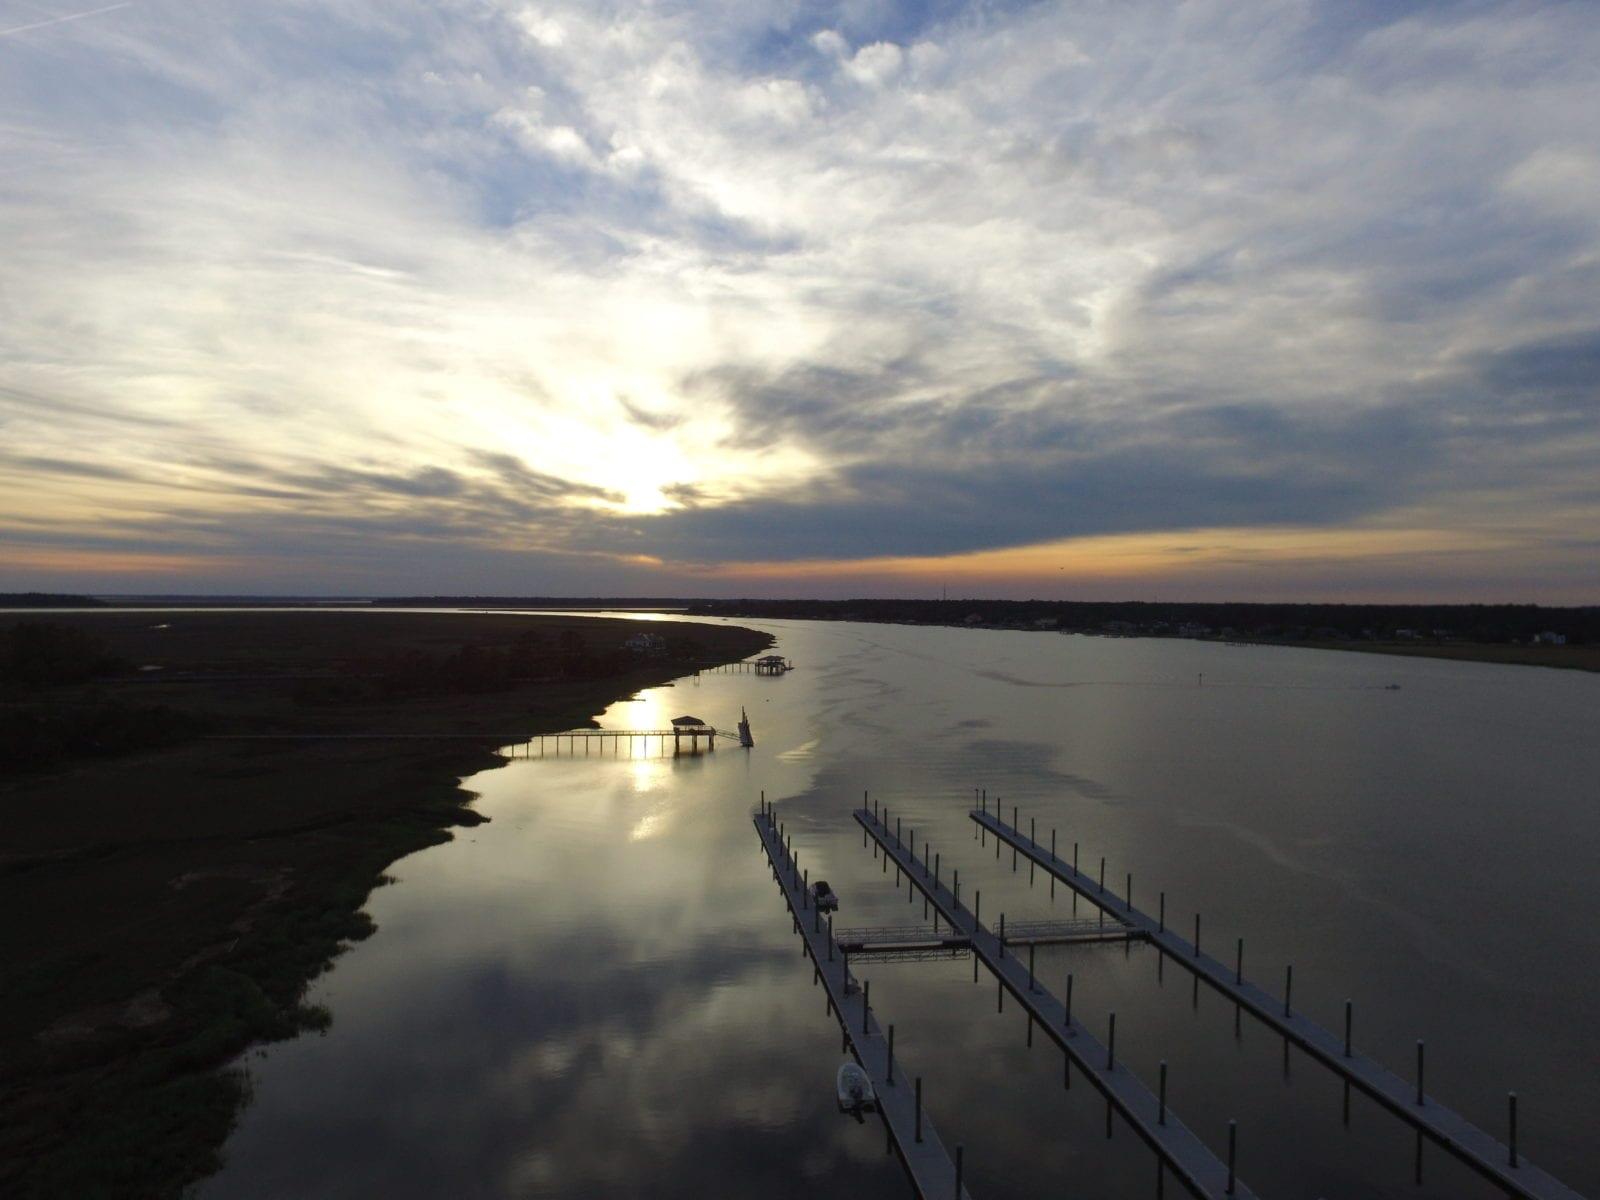 South Harbor Marina Drone Footage